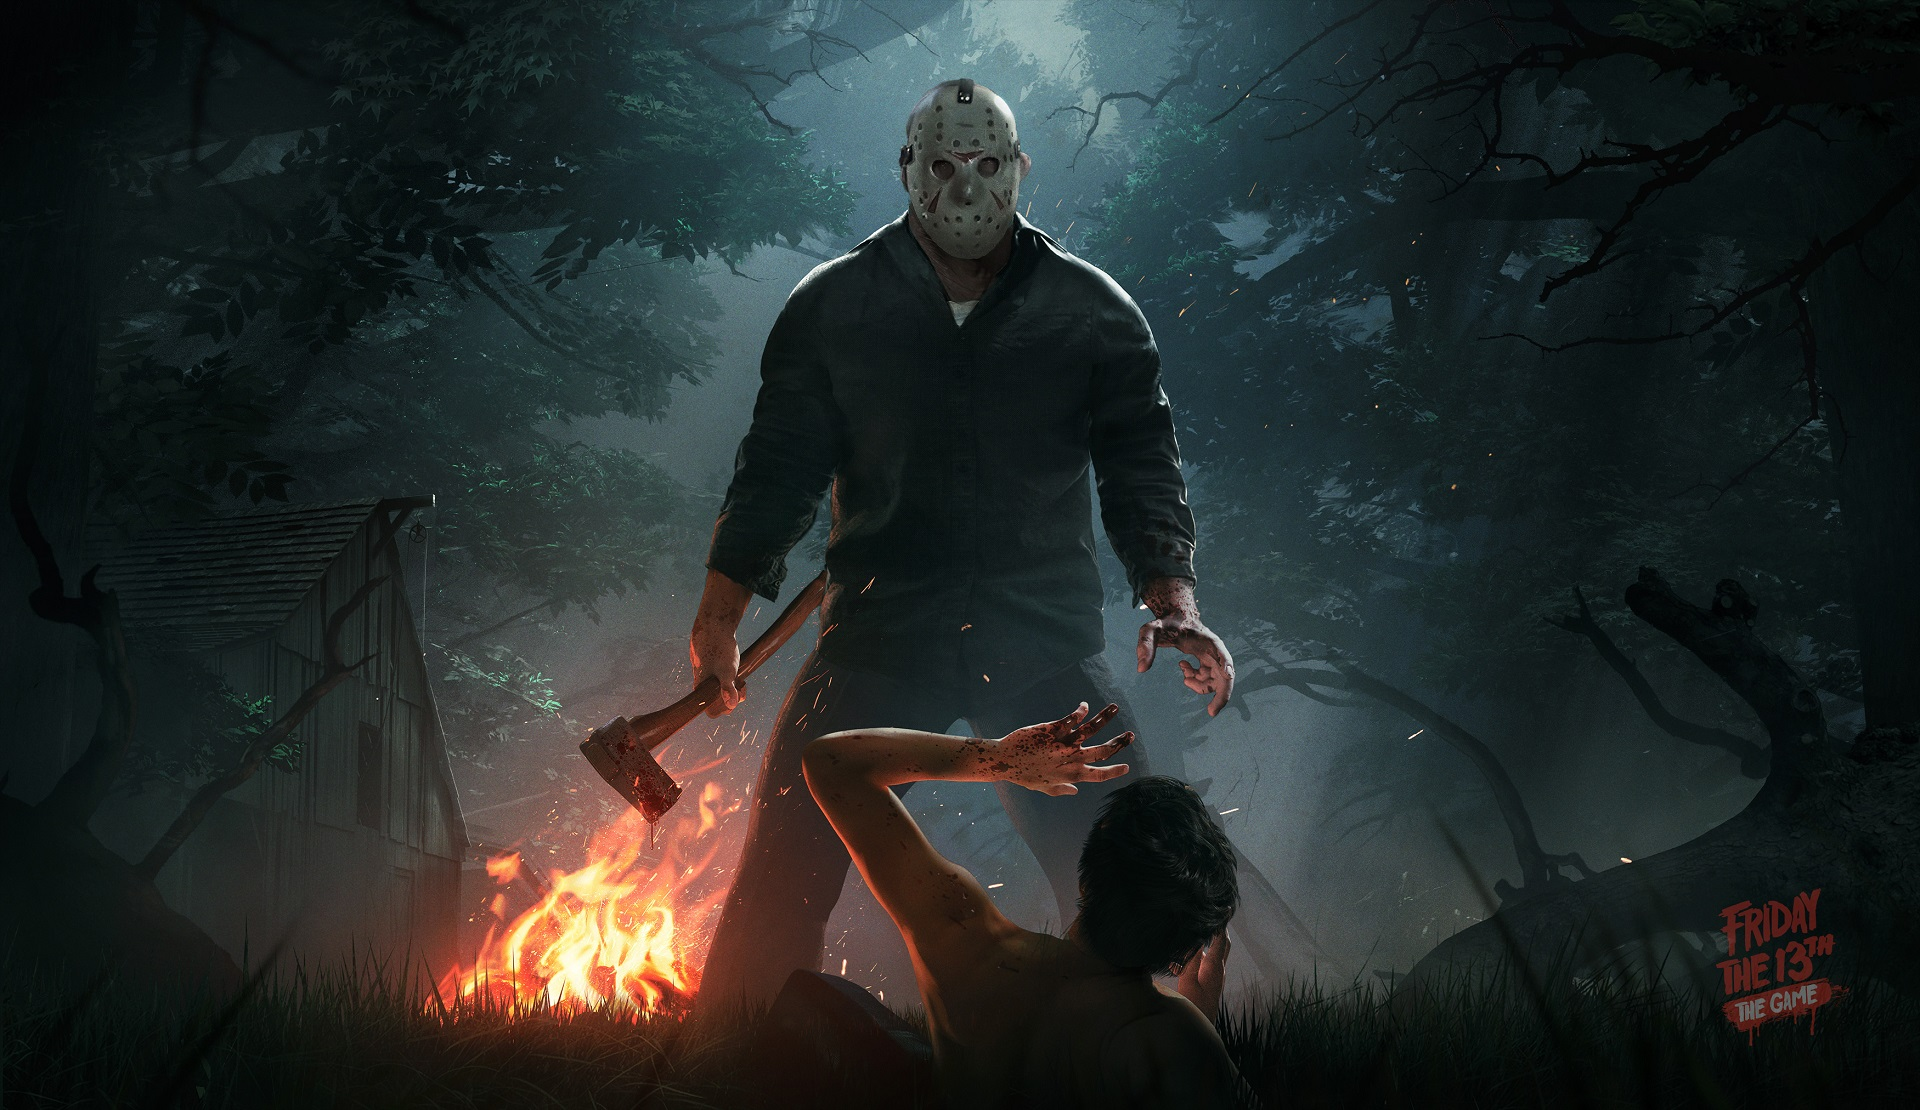 Friday the 13th starts the slashing in late May screenshot